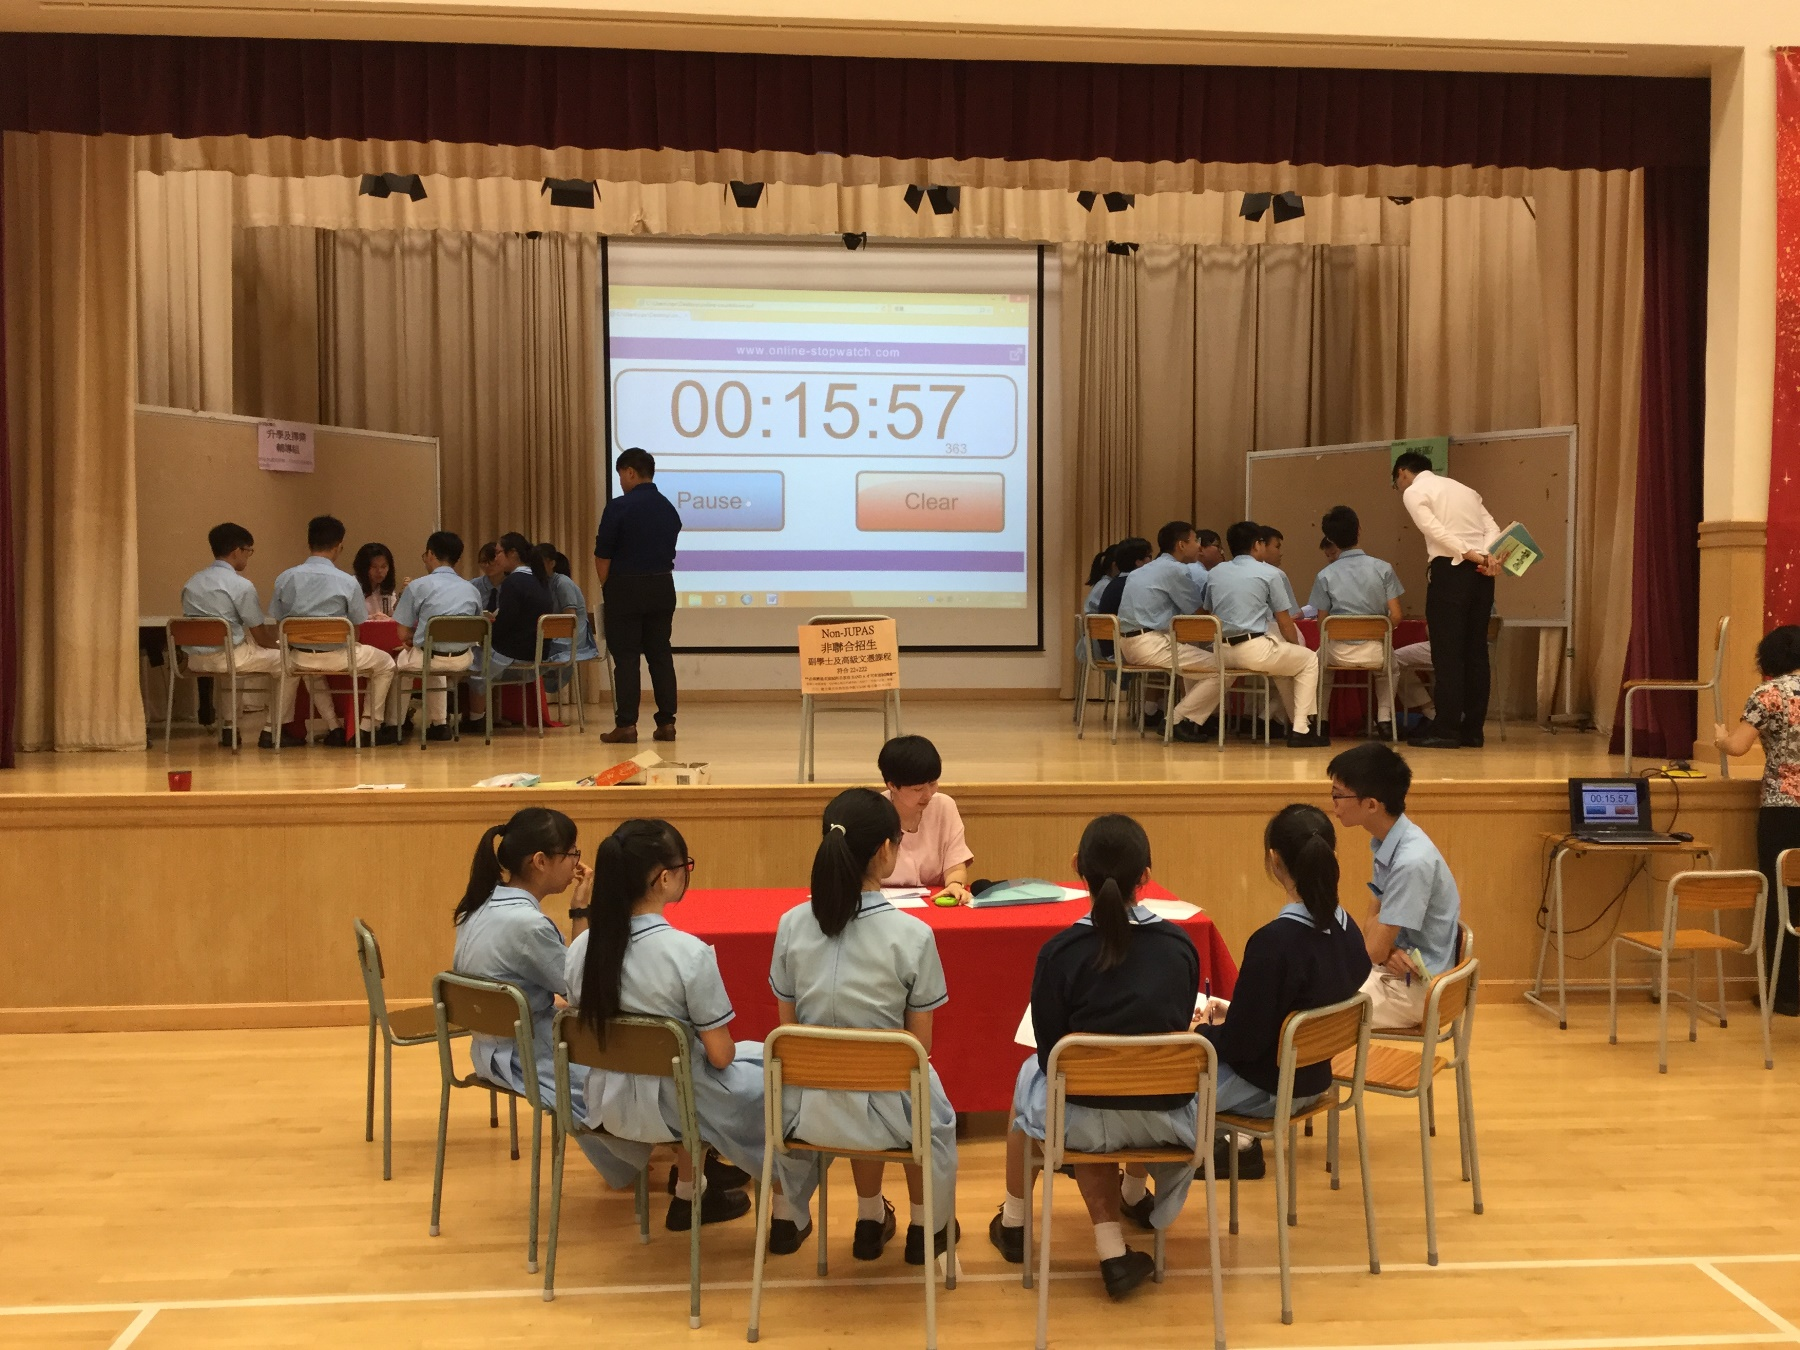 http://npc.edu.hk/sites/default/files/img_0359.jpg